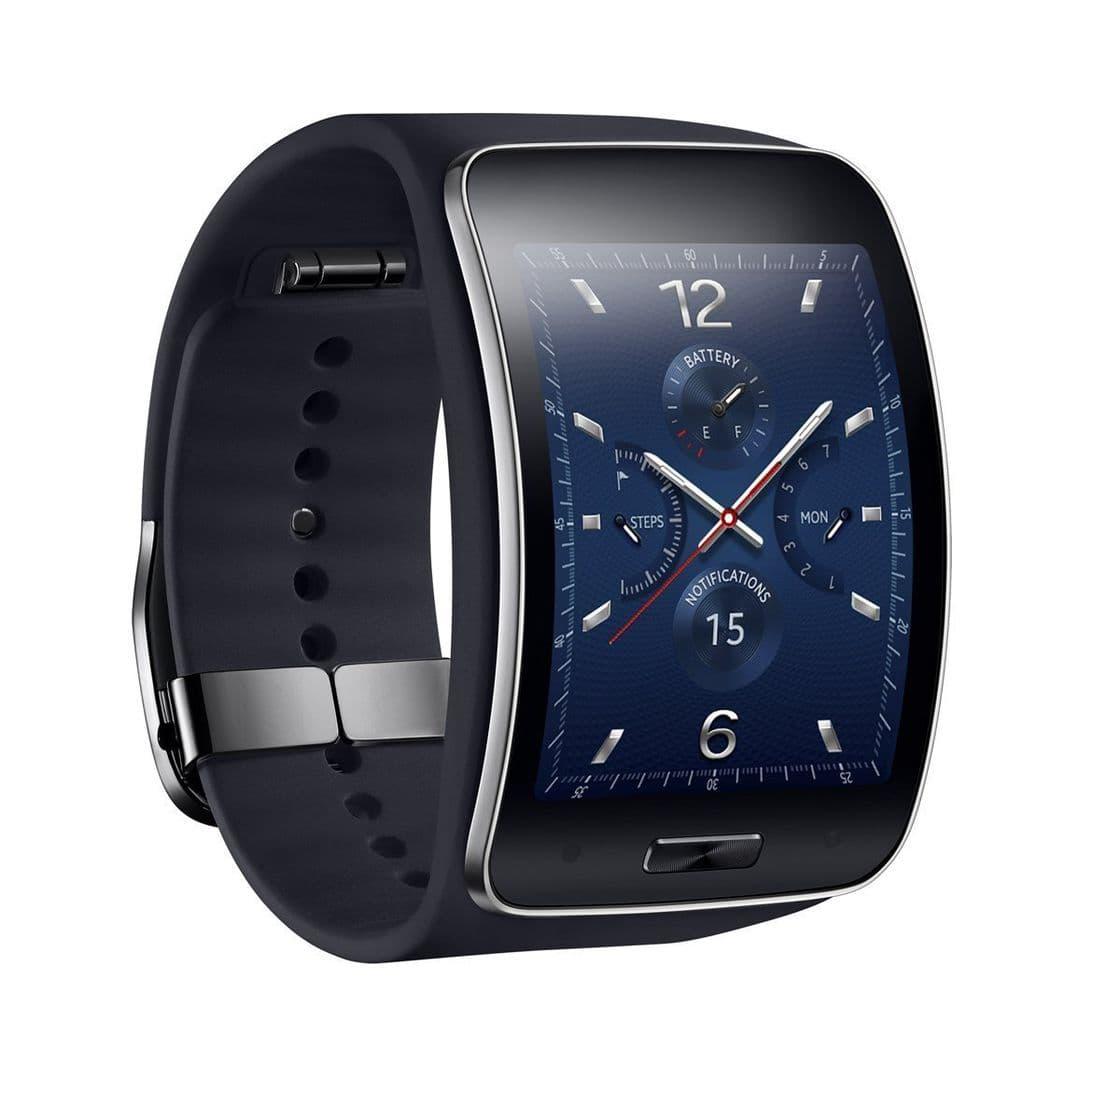 / умные часы samsung: найдено наименованийумные часы samsung: найдено наименований.